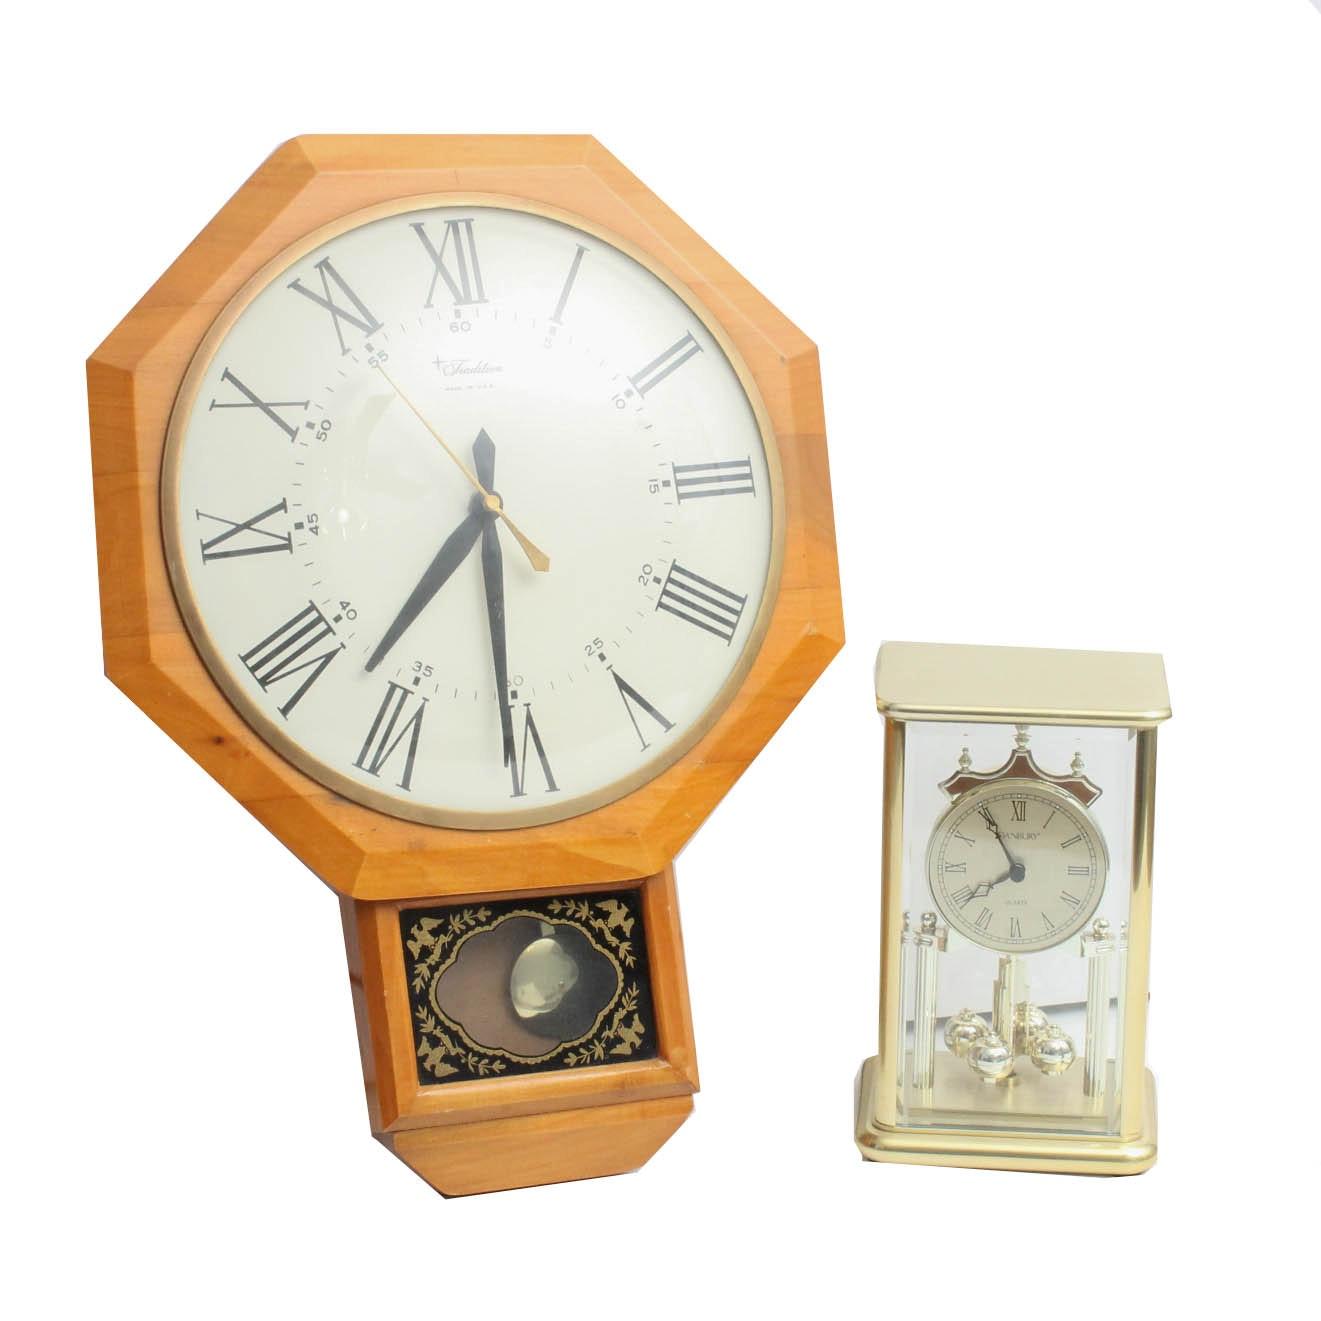 Tradition Wall Clock and Danbury Anniversary Clock